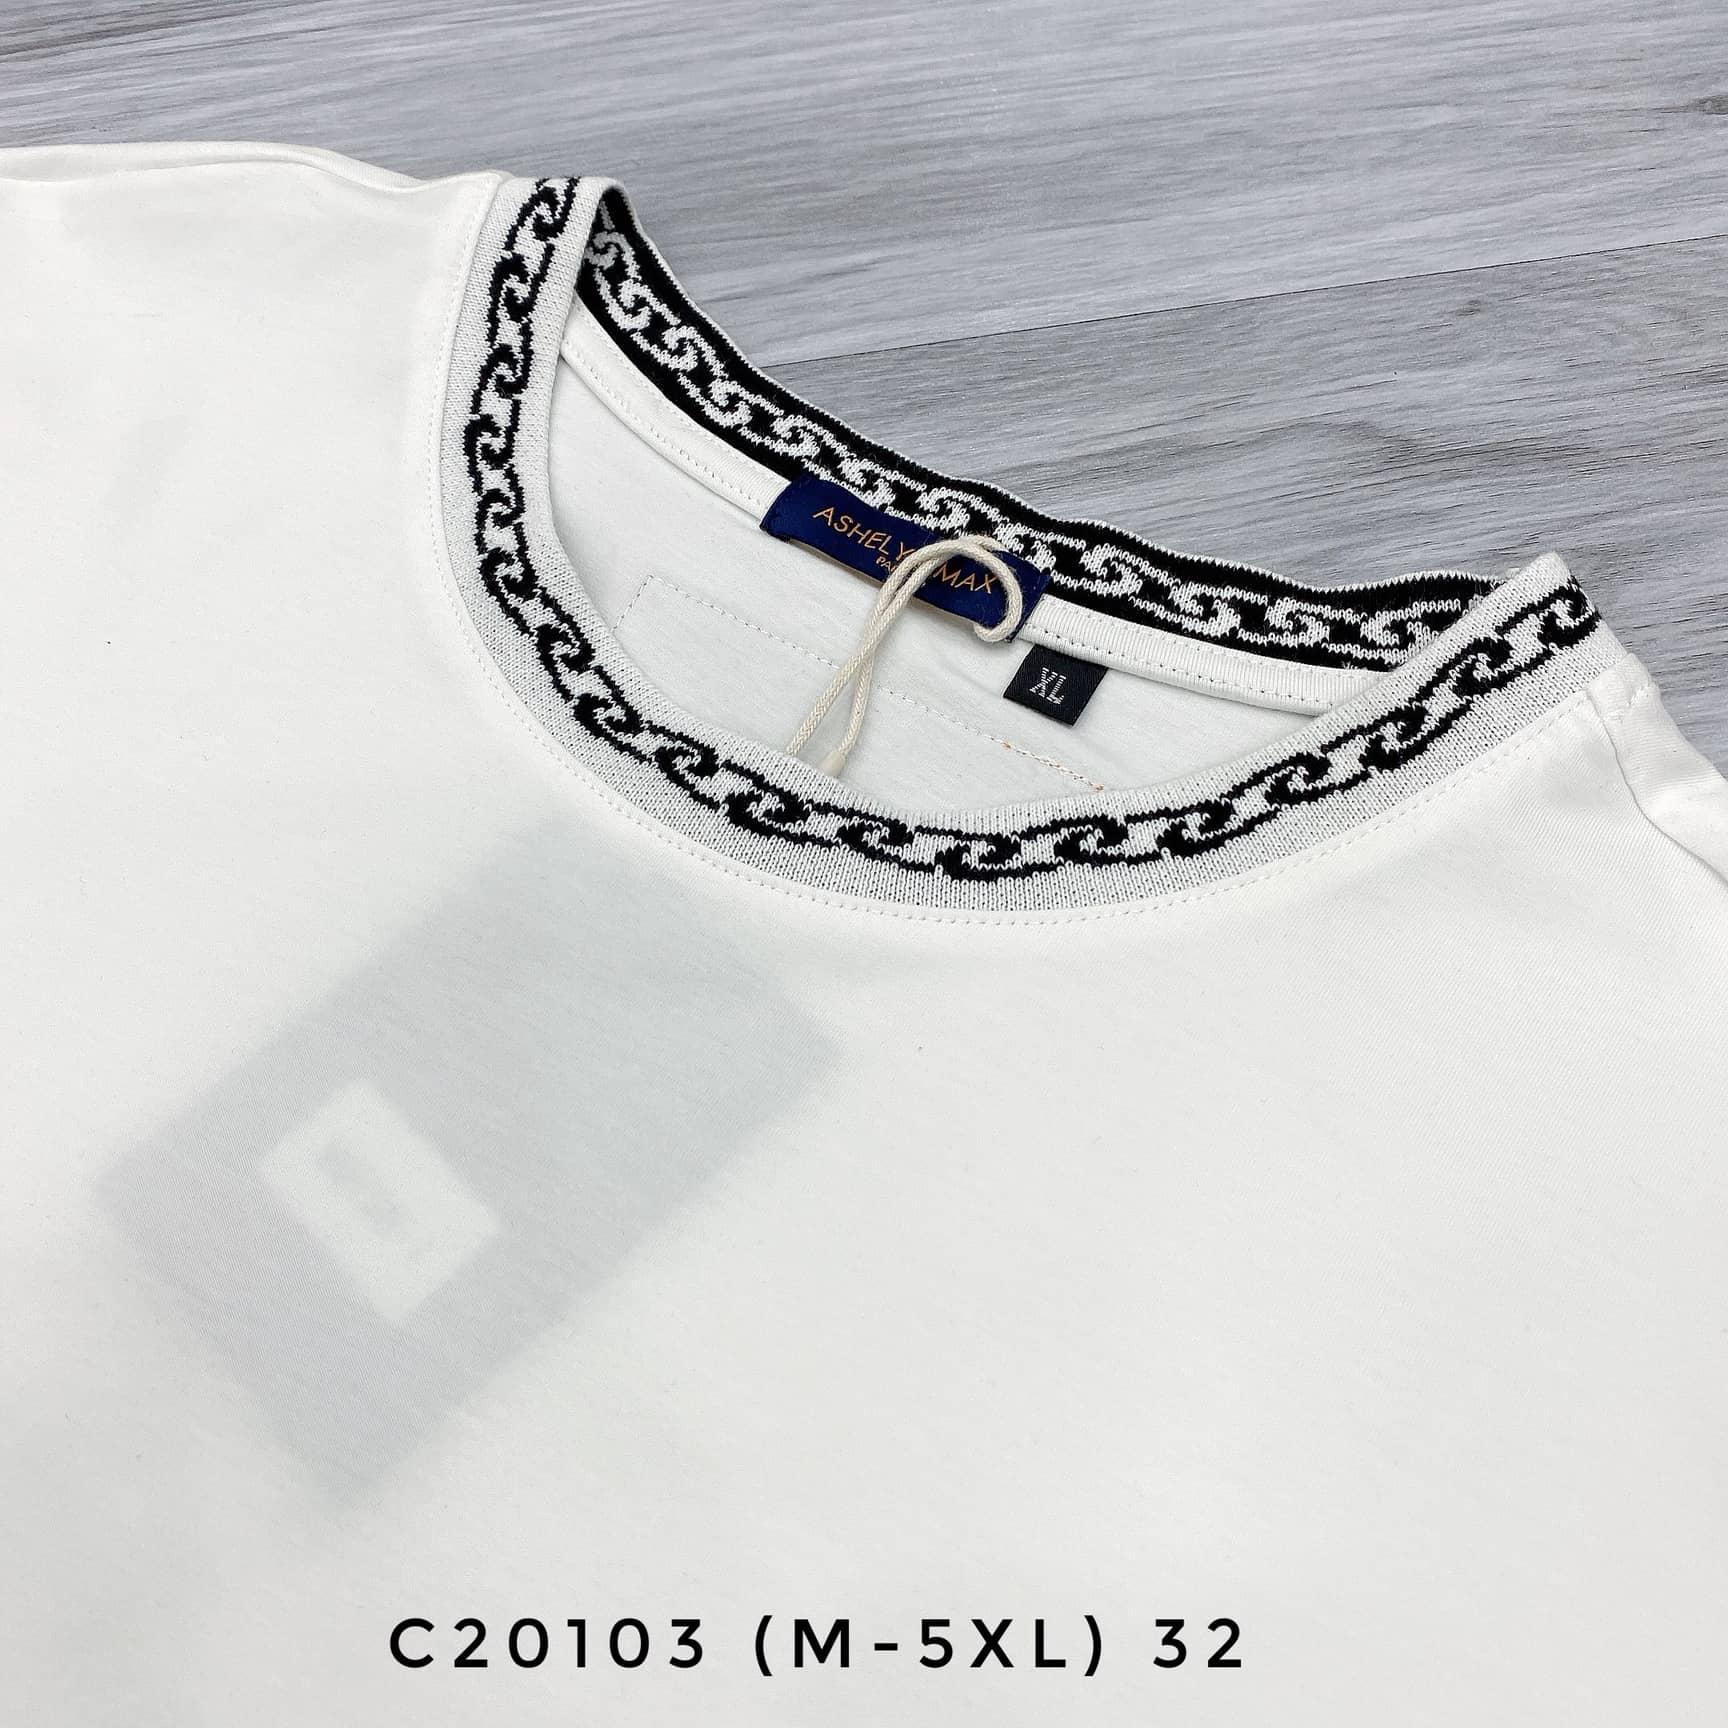 AT CỔ TRÒN C20103 (M-5XL)